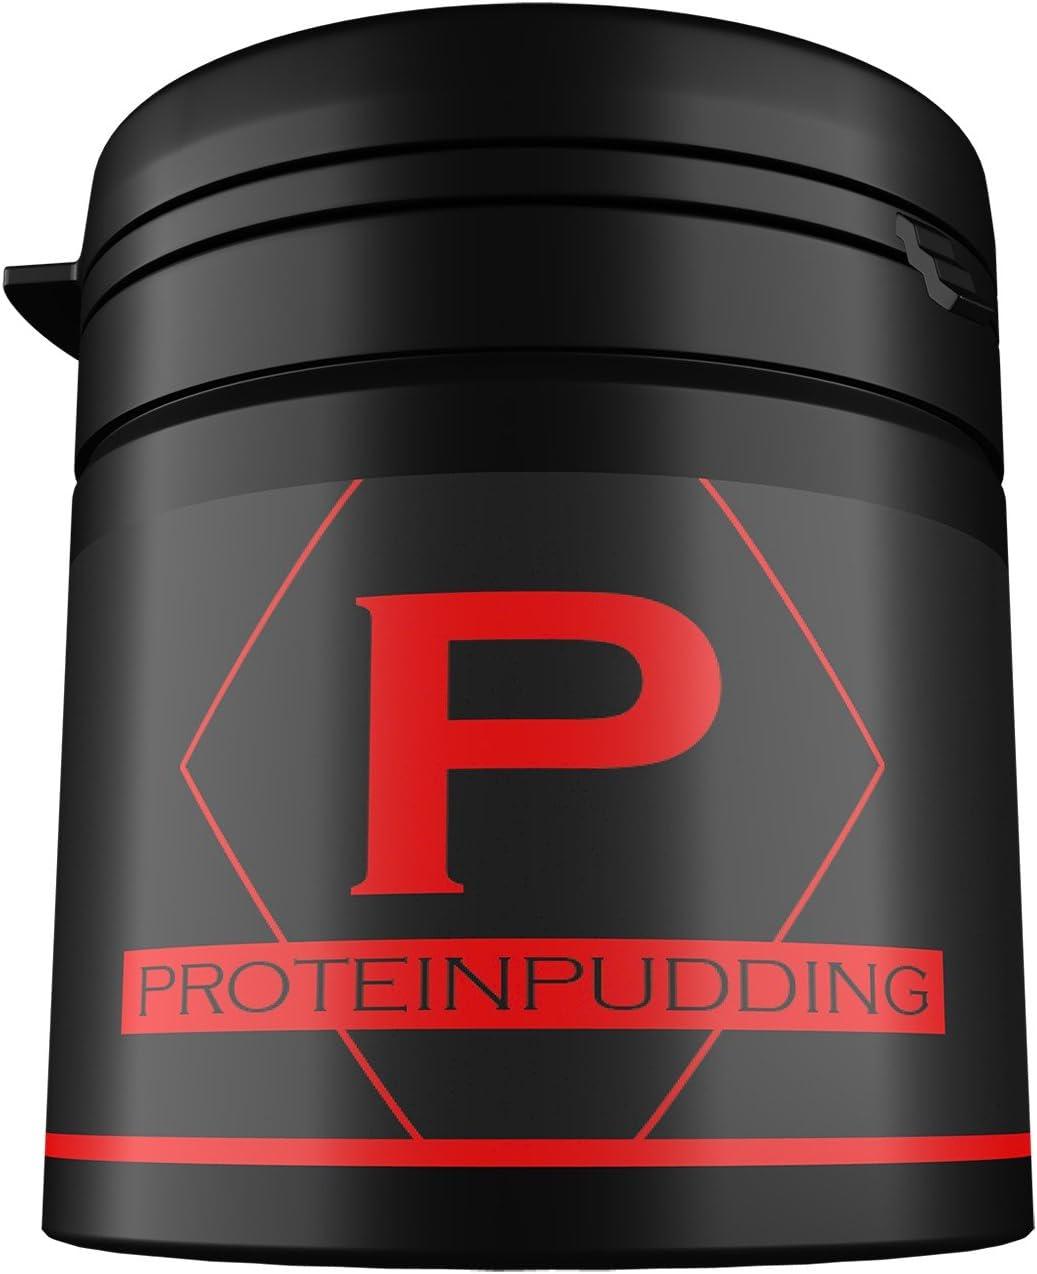 NatureHolic ProteinPudding - Comida para camarones (50 g)